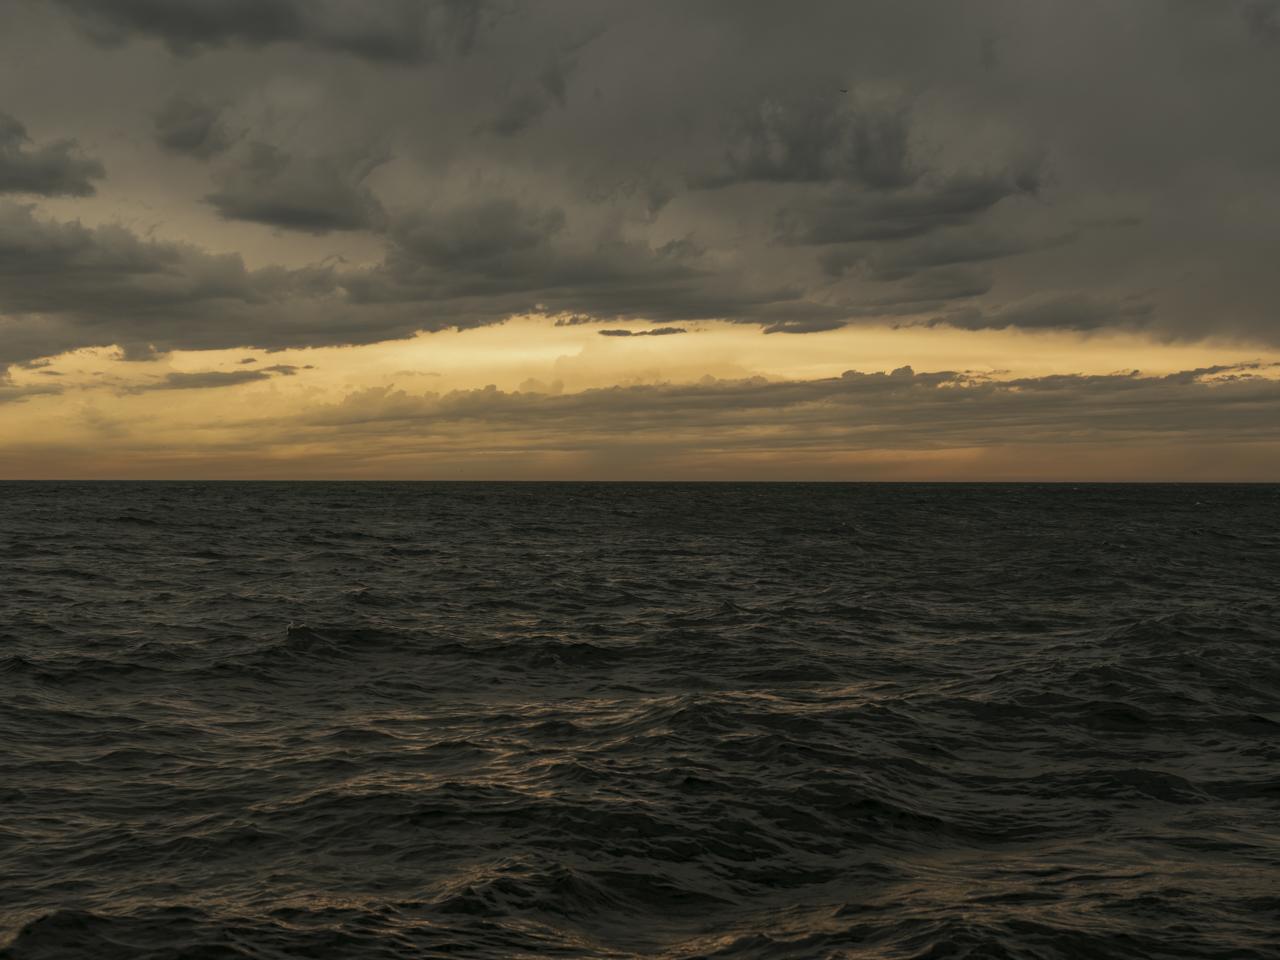 a dramatic dark lake and sky with hazy yellow light